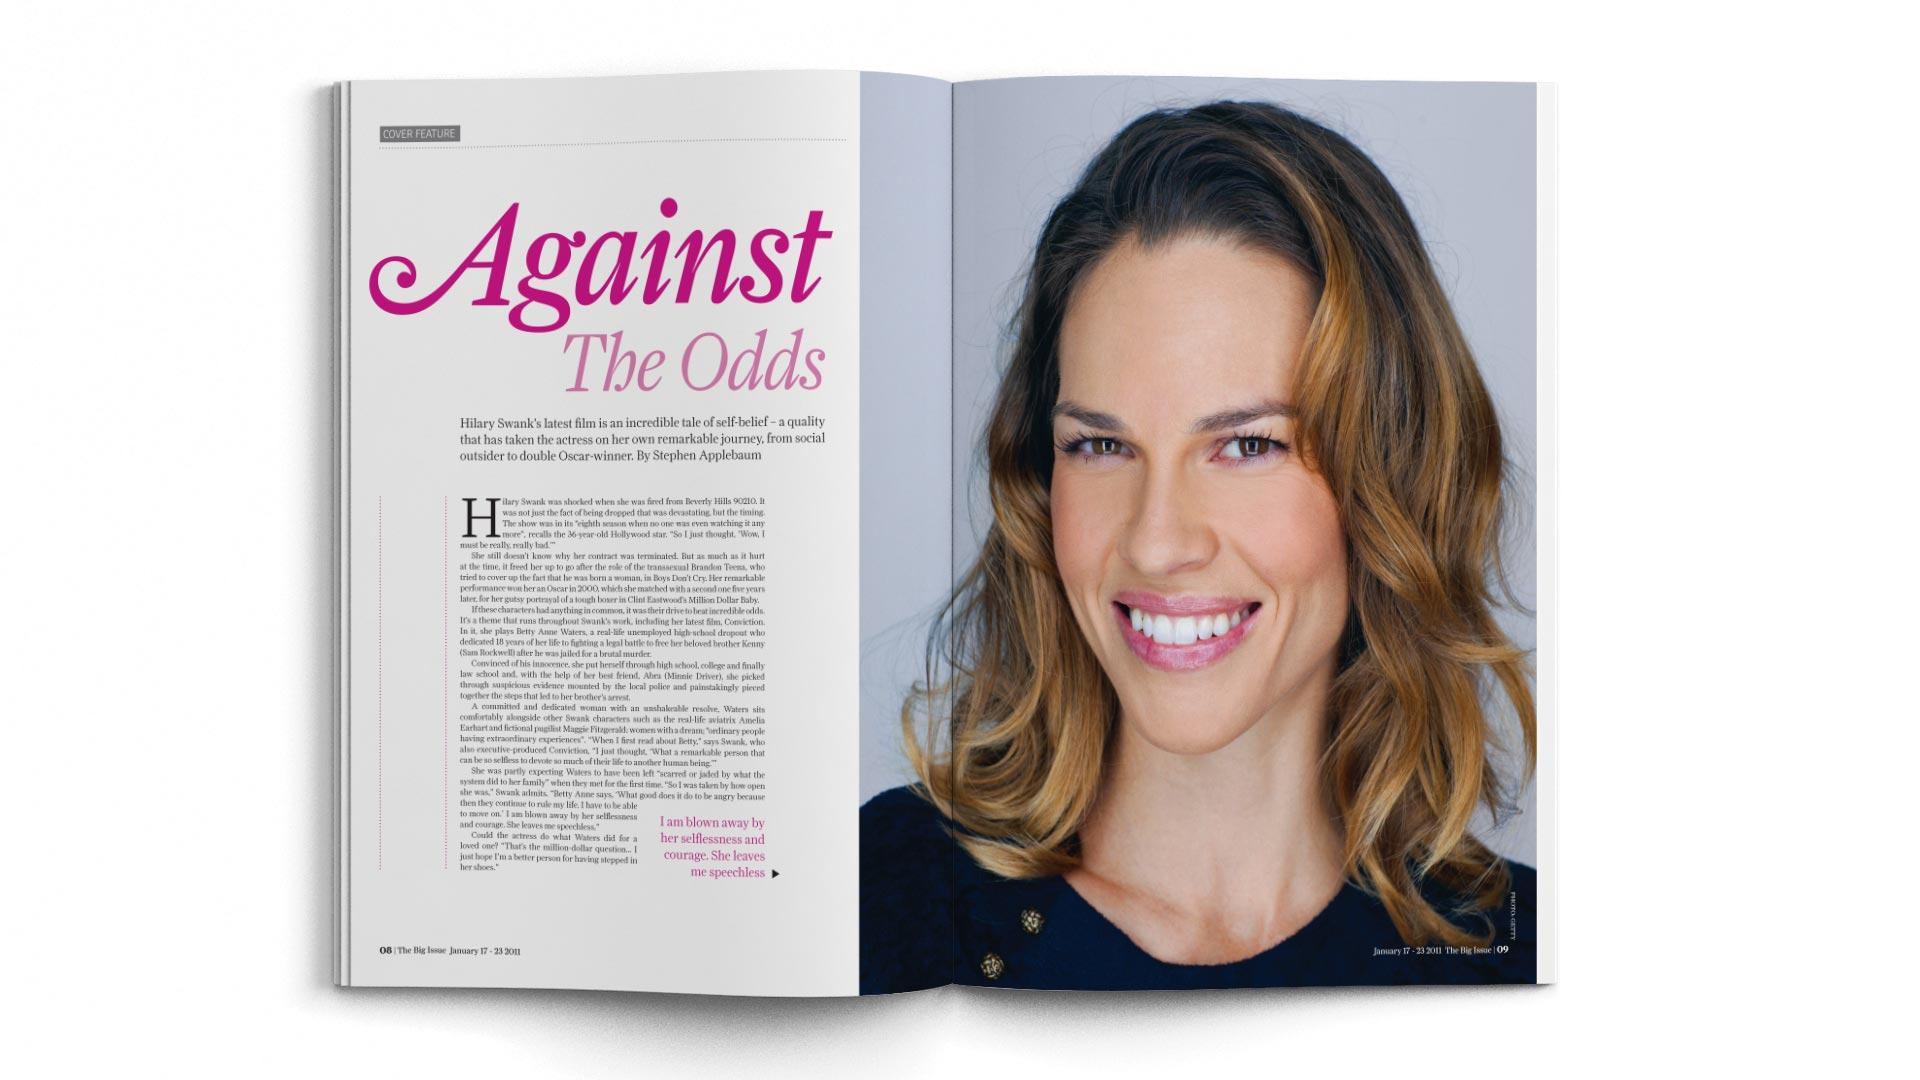 A4-Magazine-DPS-TBI-Hilary-Swank